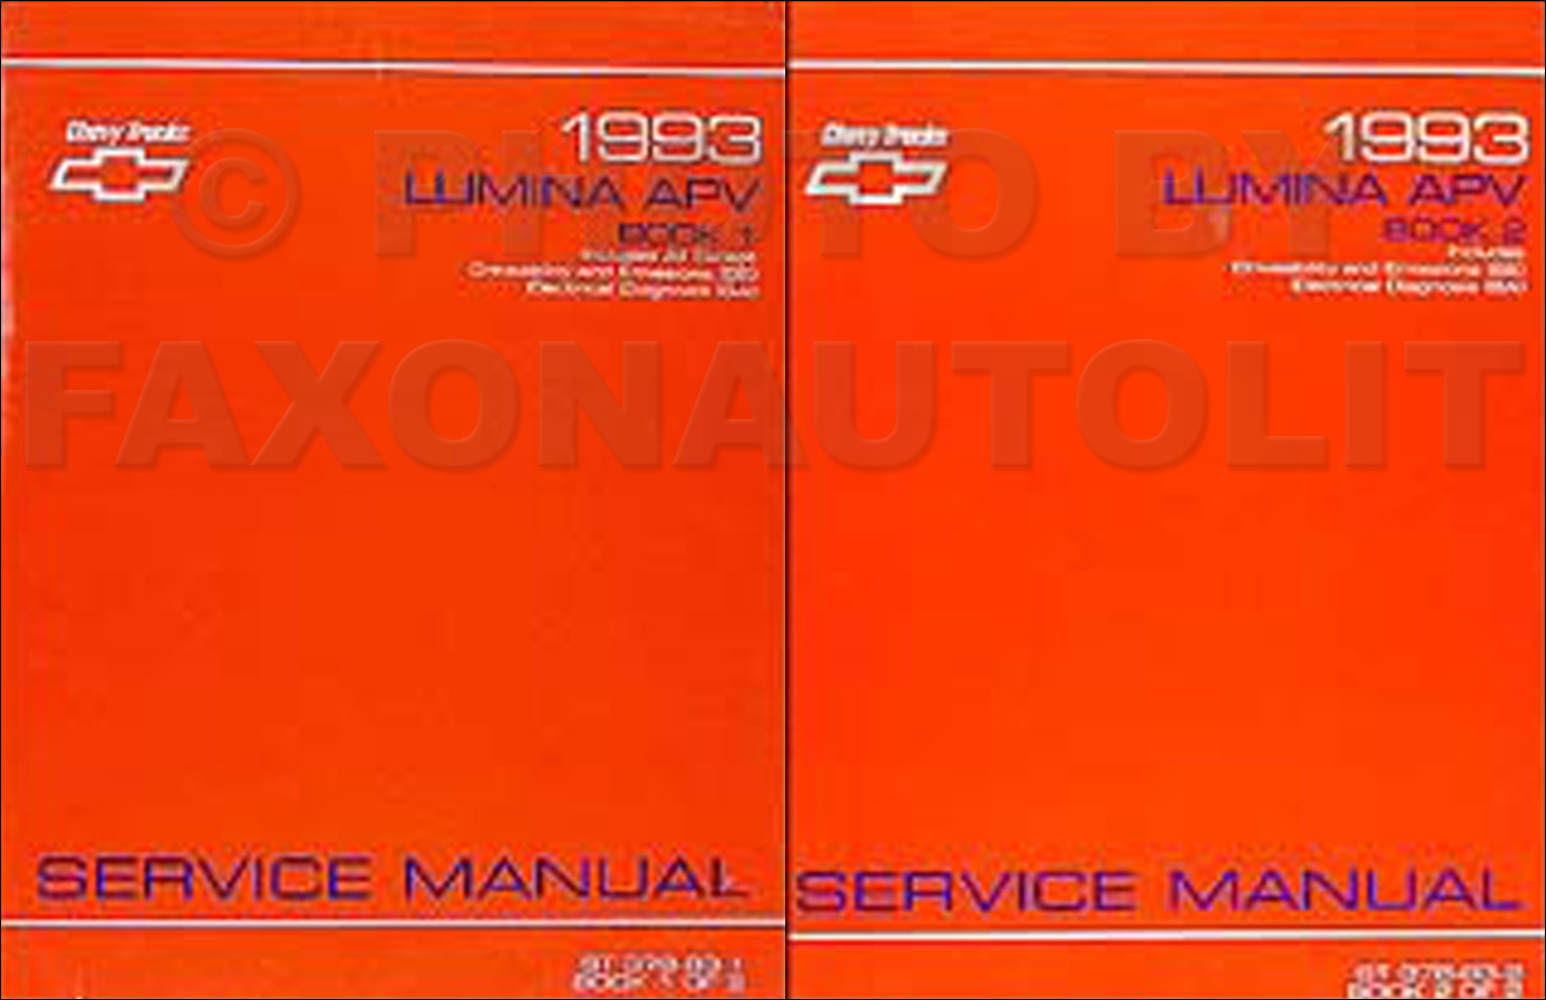 1993 Chevy Lumina APV Minivan Repair Manual Original 2 Vol Set